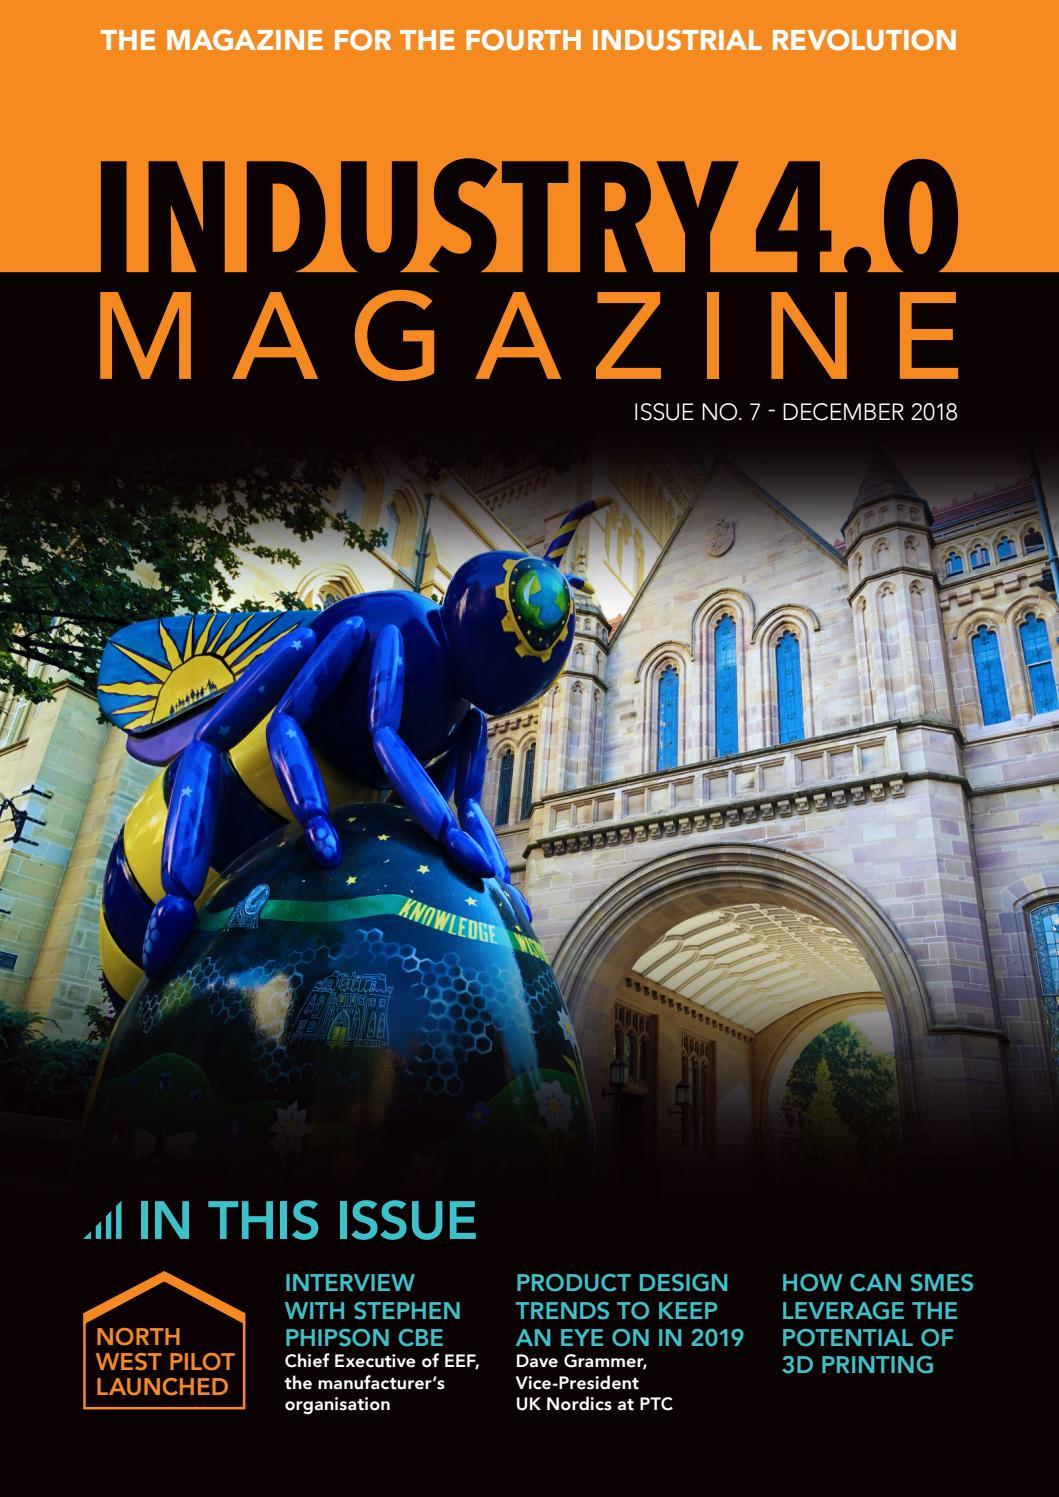 Industry 4 0 Magazine by GB Media & Events Ltd  - issuu